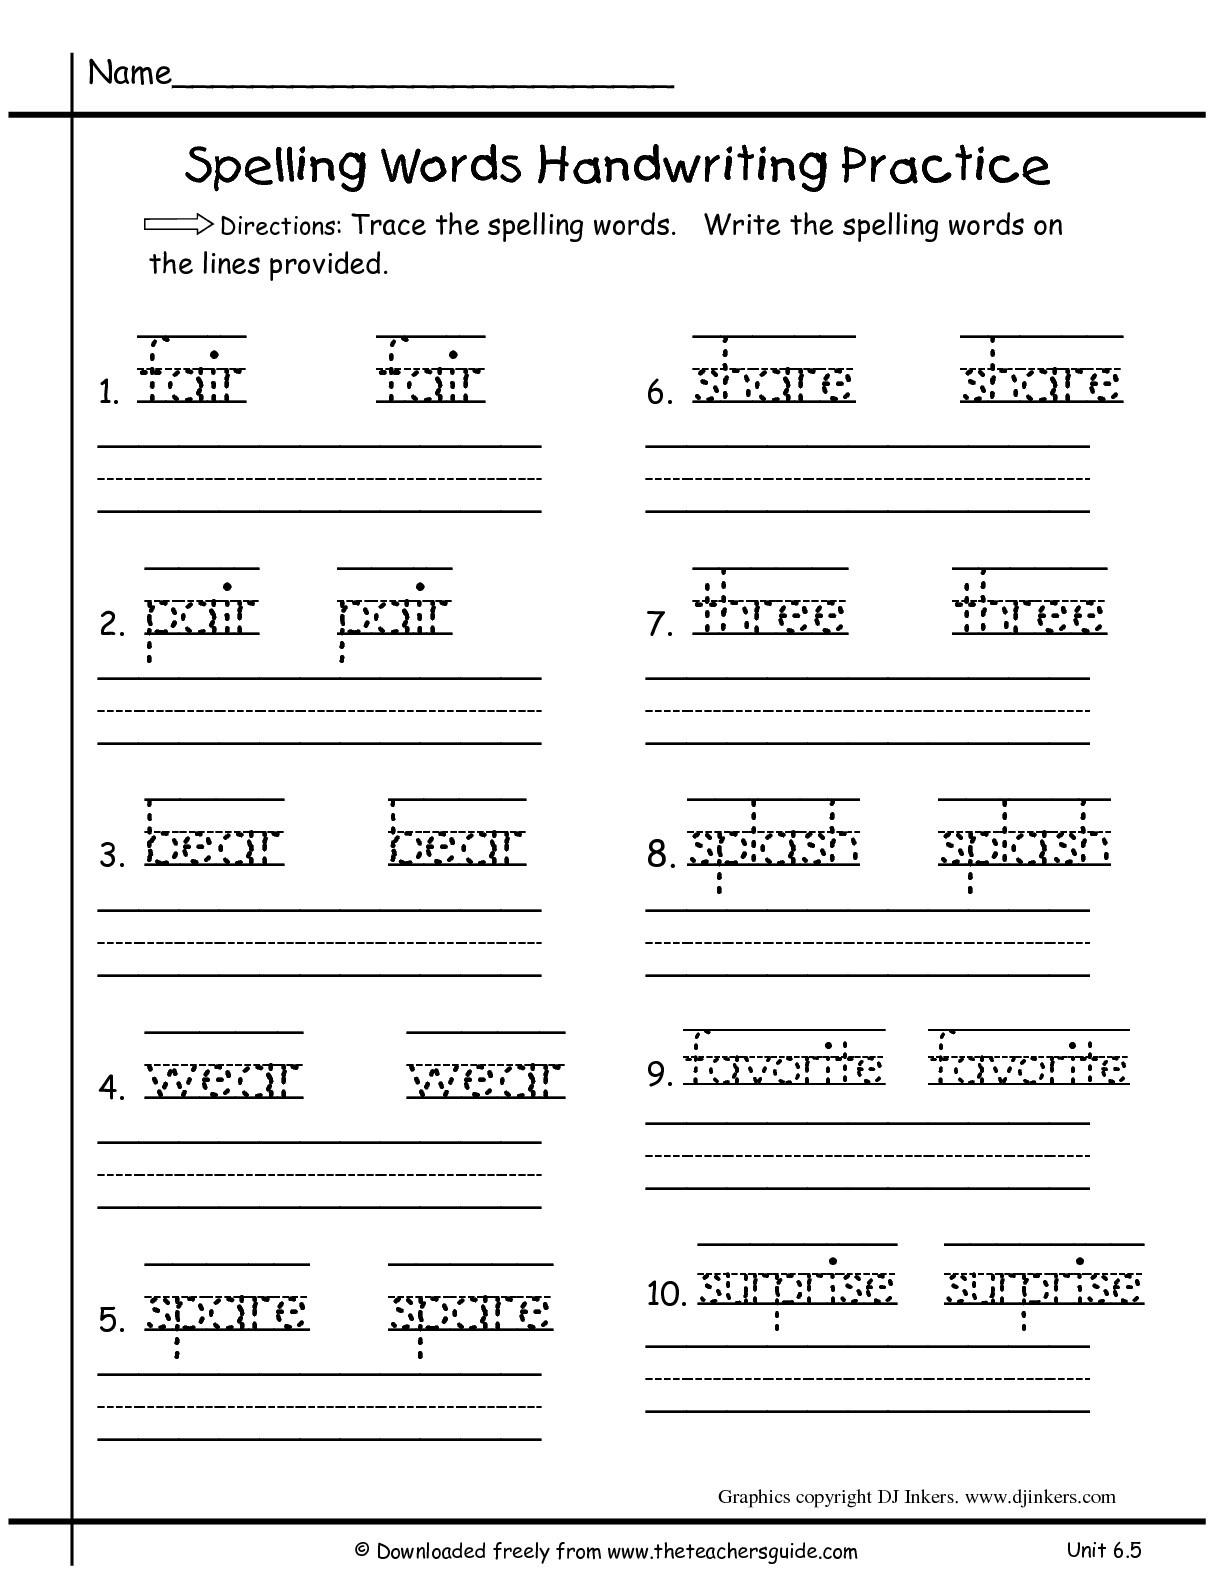 1St Grade Language Arts Worksheets To Free Download - Math Worksheet - Free Printable Worksheets For 1St Grade Language Arts